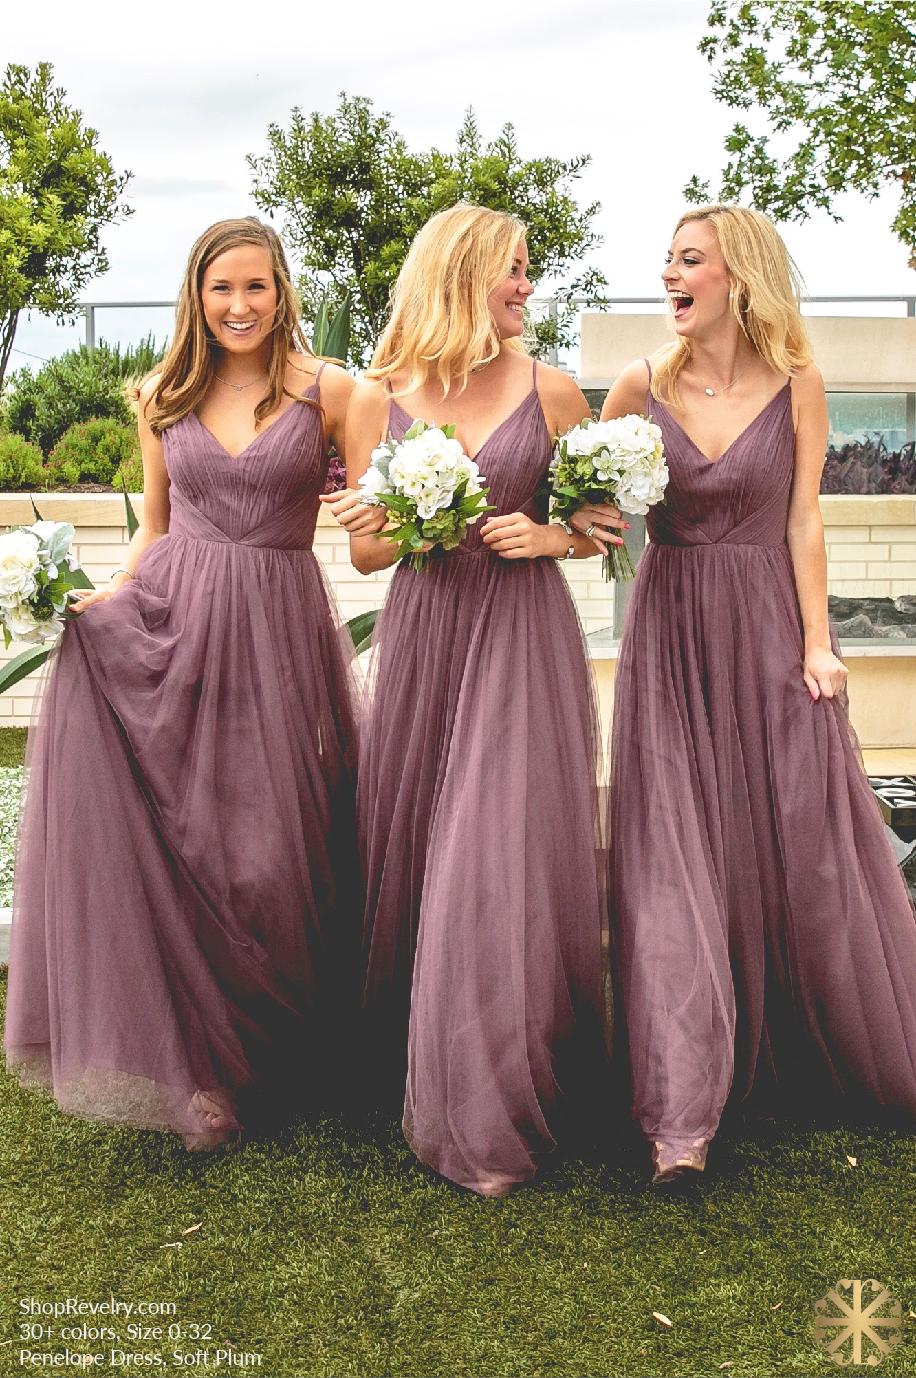 e0b0b23775f4 Purples  Penelope Dress